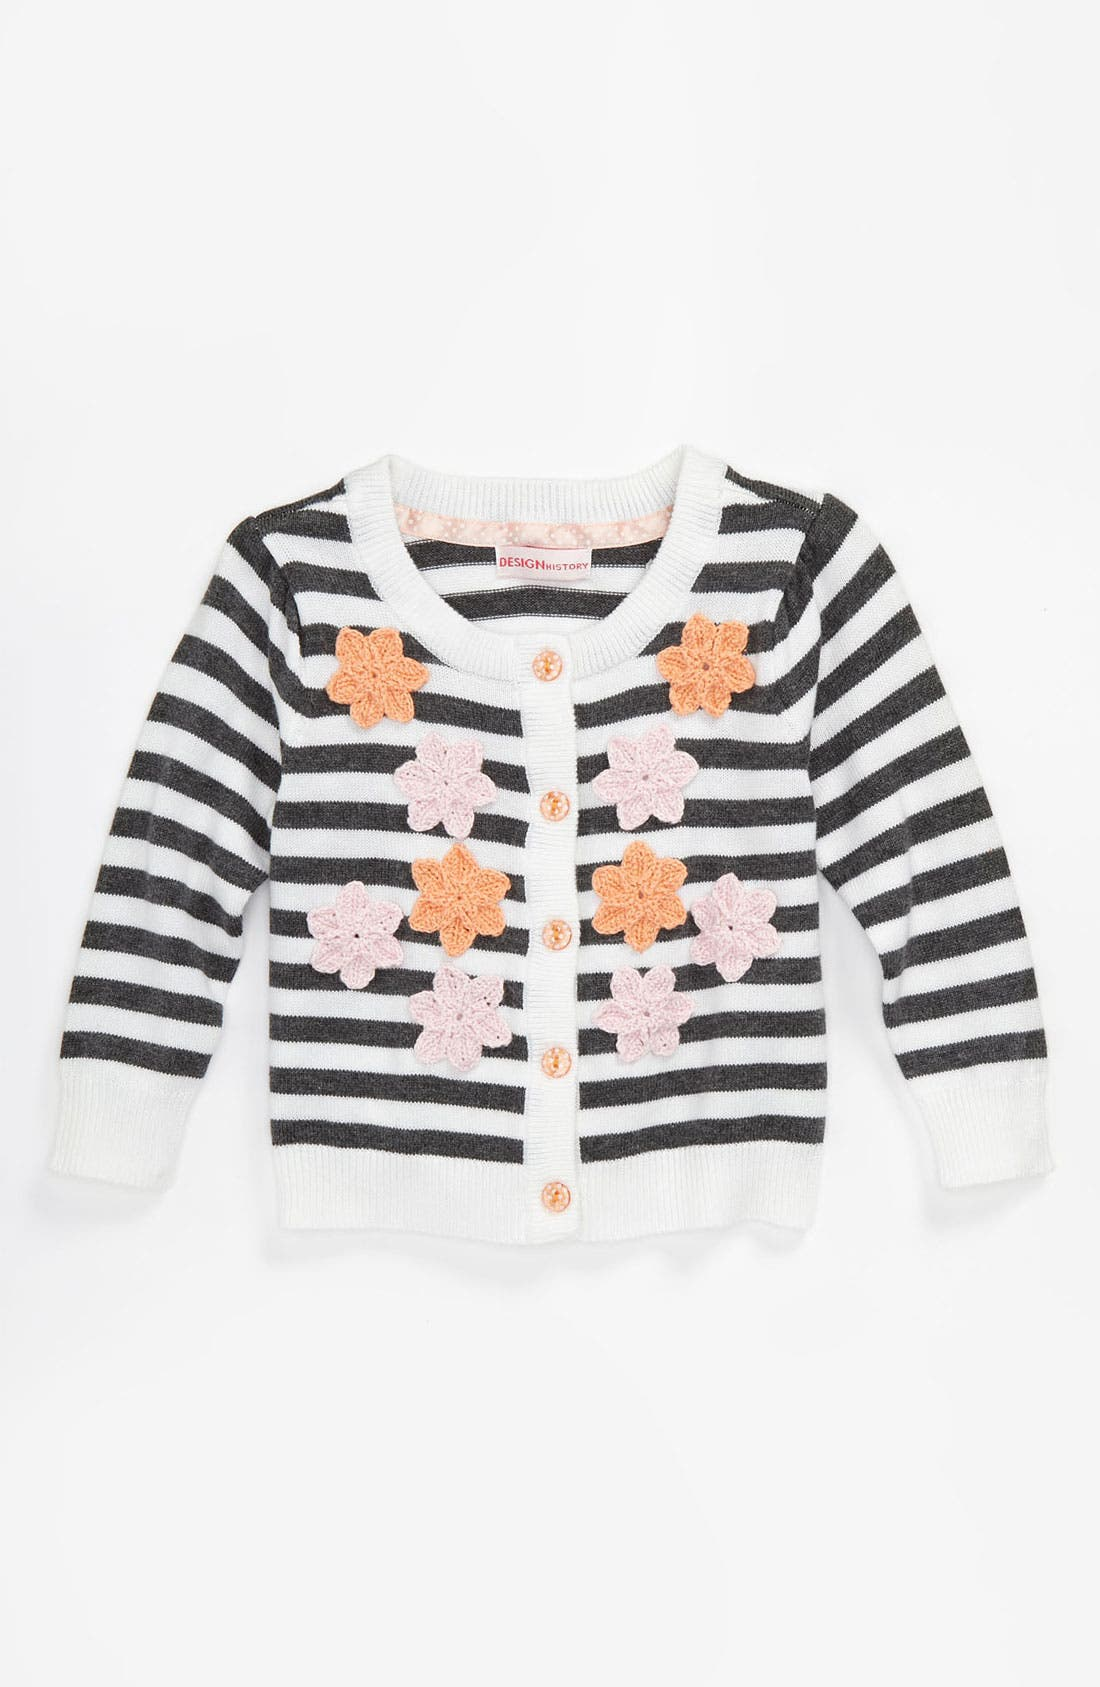 Alternate Image 1 Selected - Design History Stripe Cardigan (Infant)